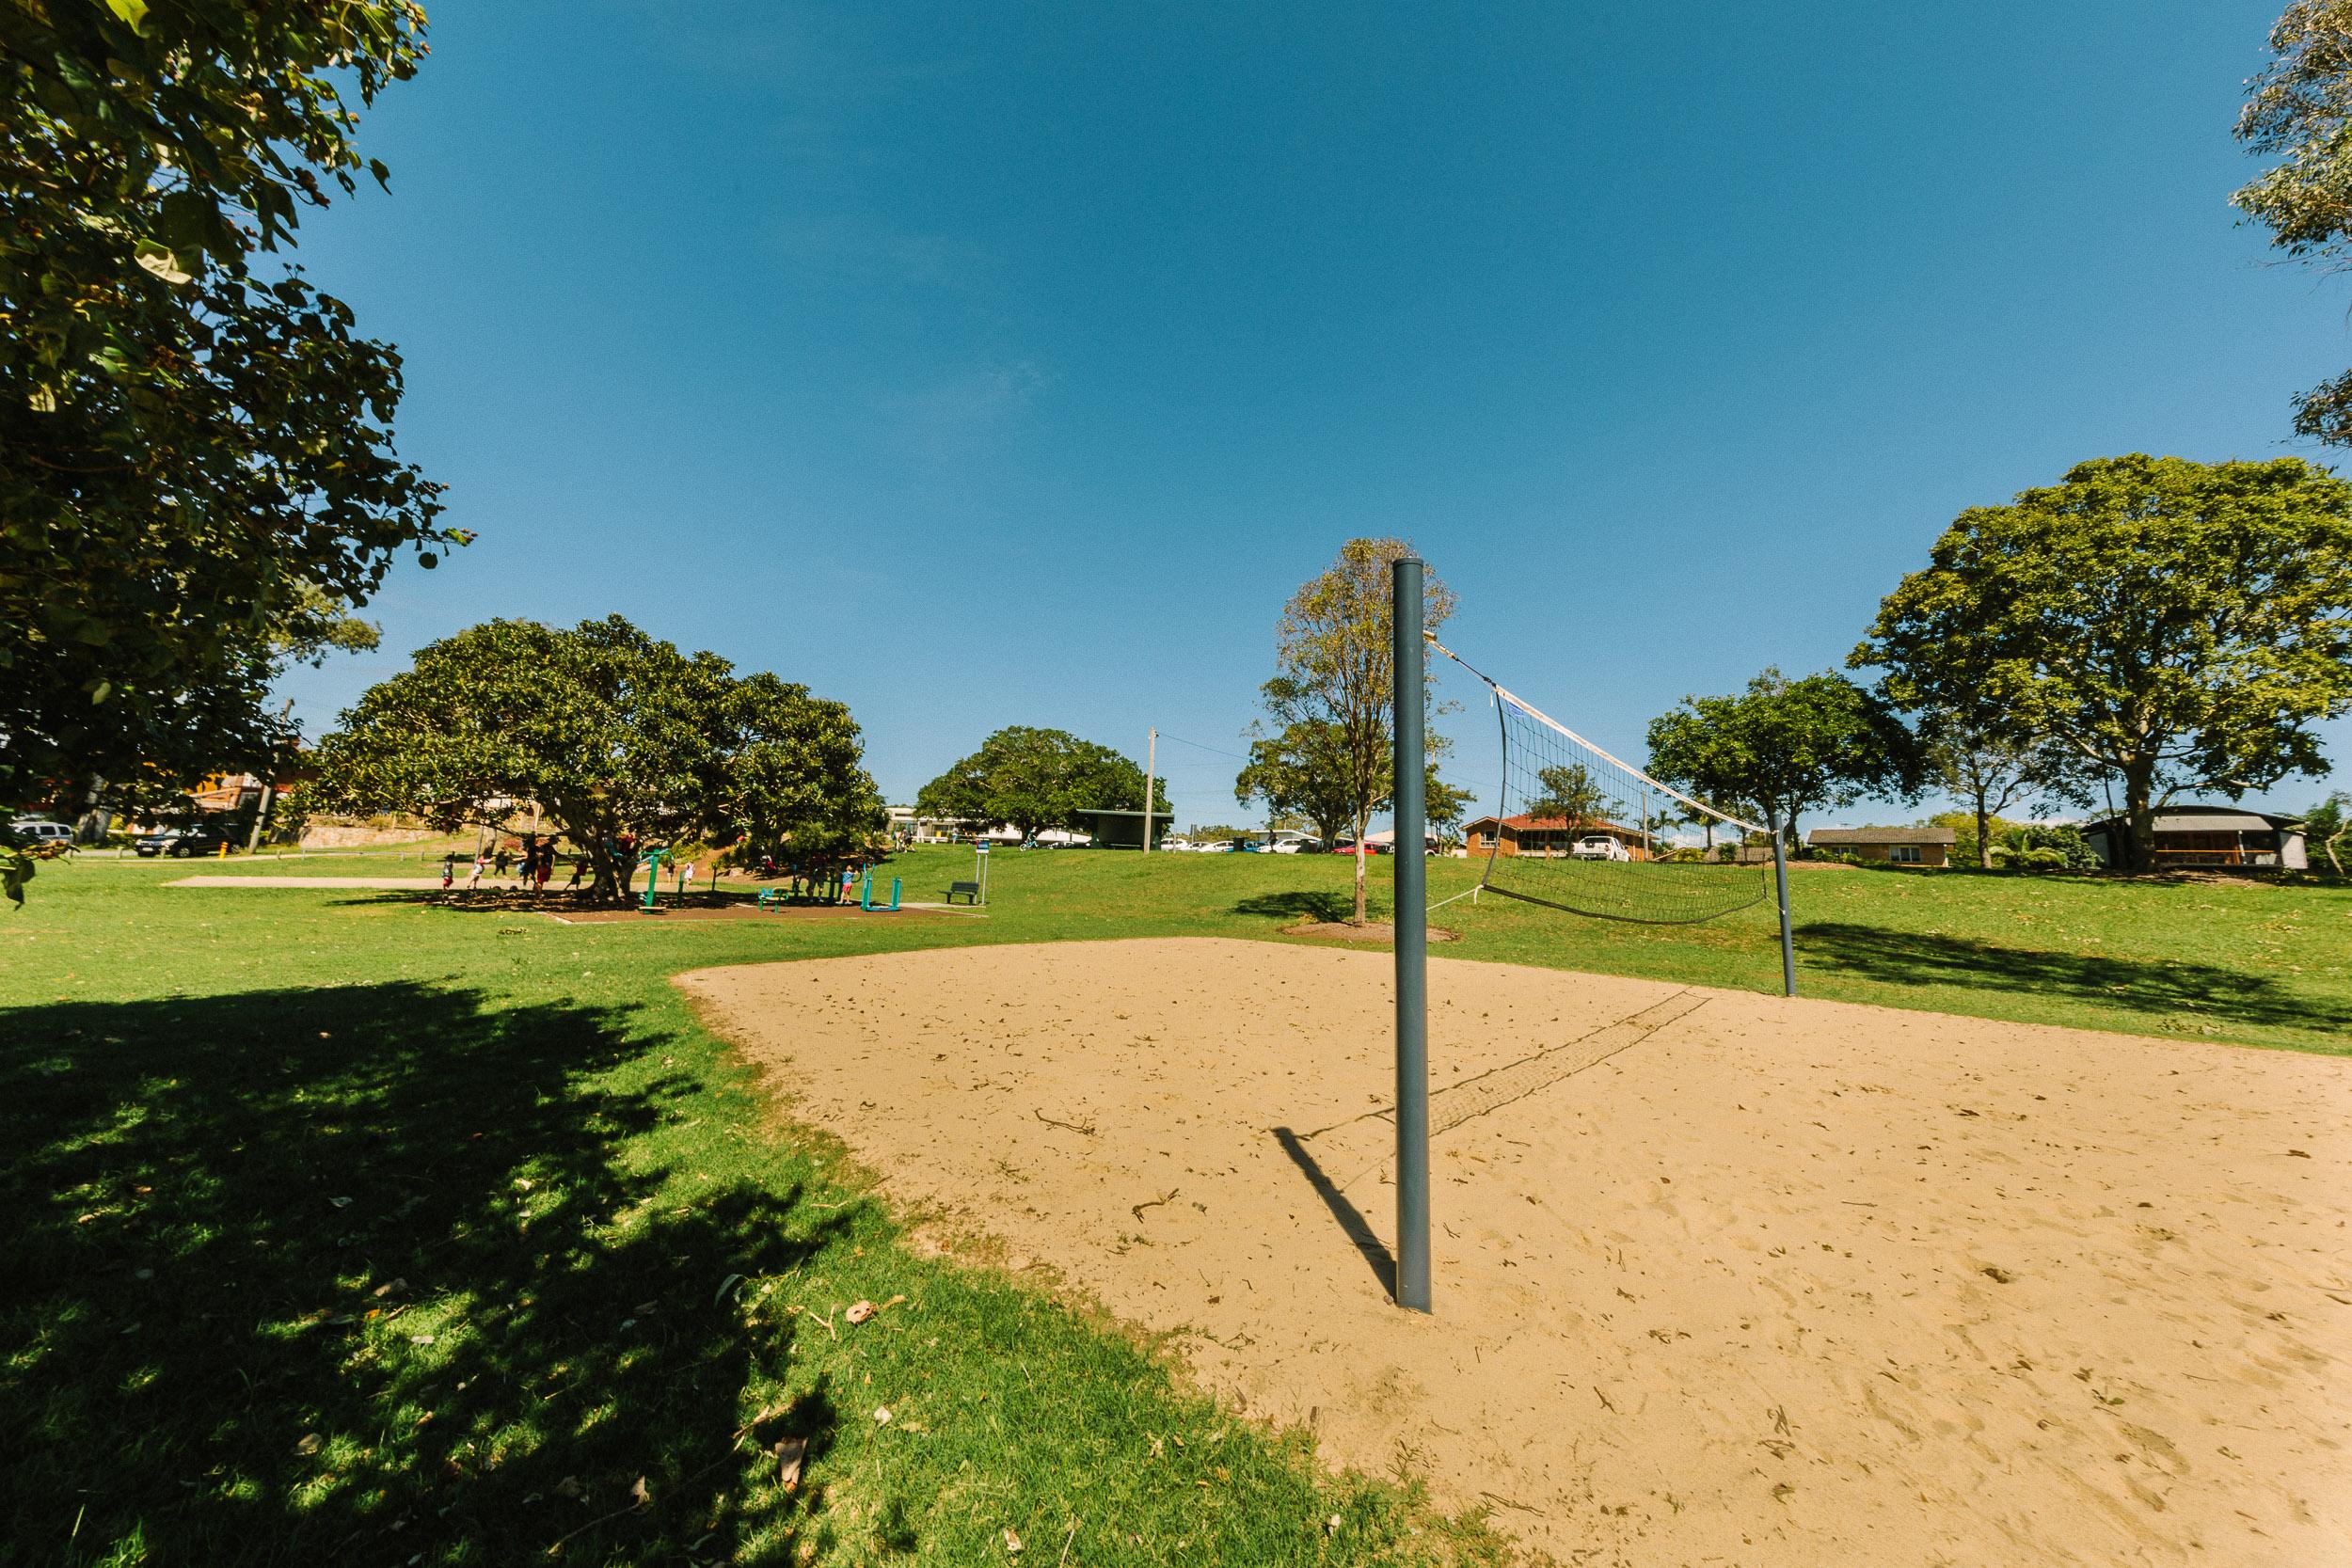 Beth Boyd Park Volleyball Court